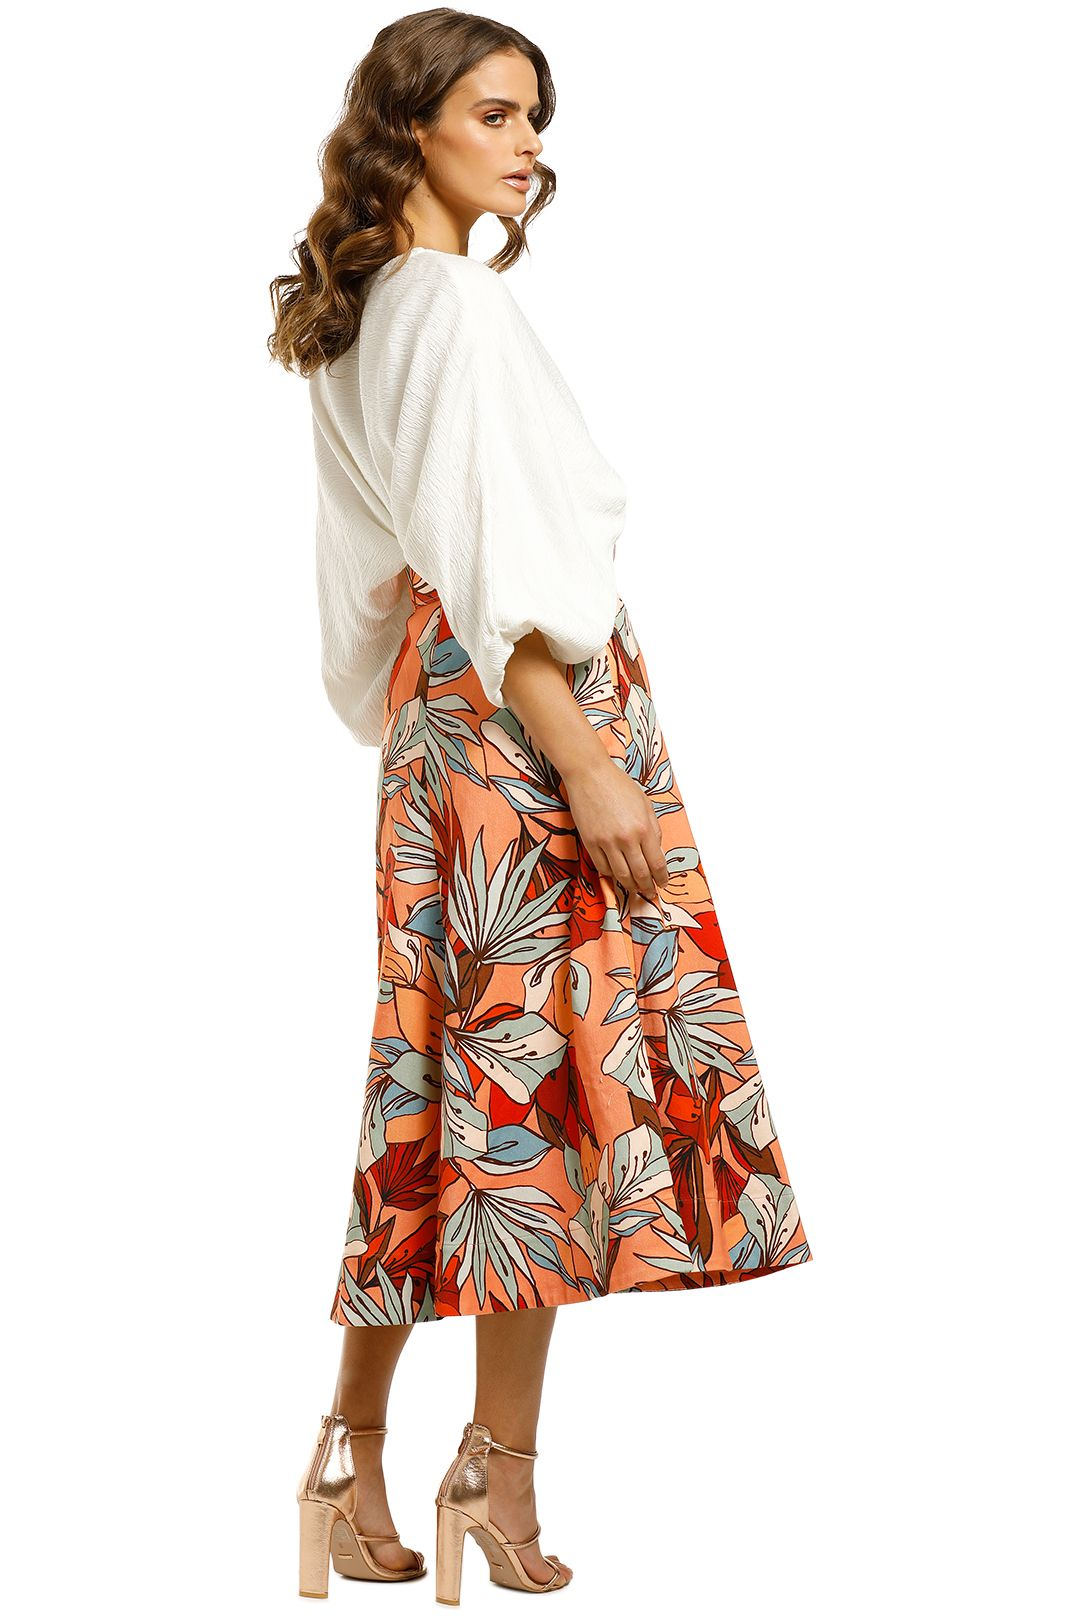 Nicholas-Jacqueline-Skirt-Tarama-Deco-Floral-Back